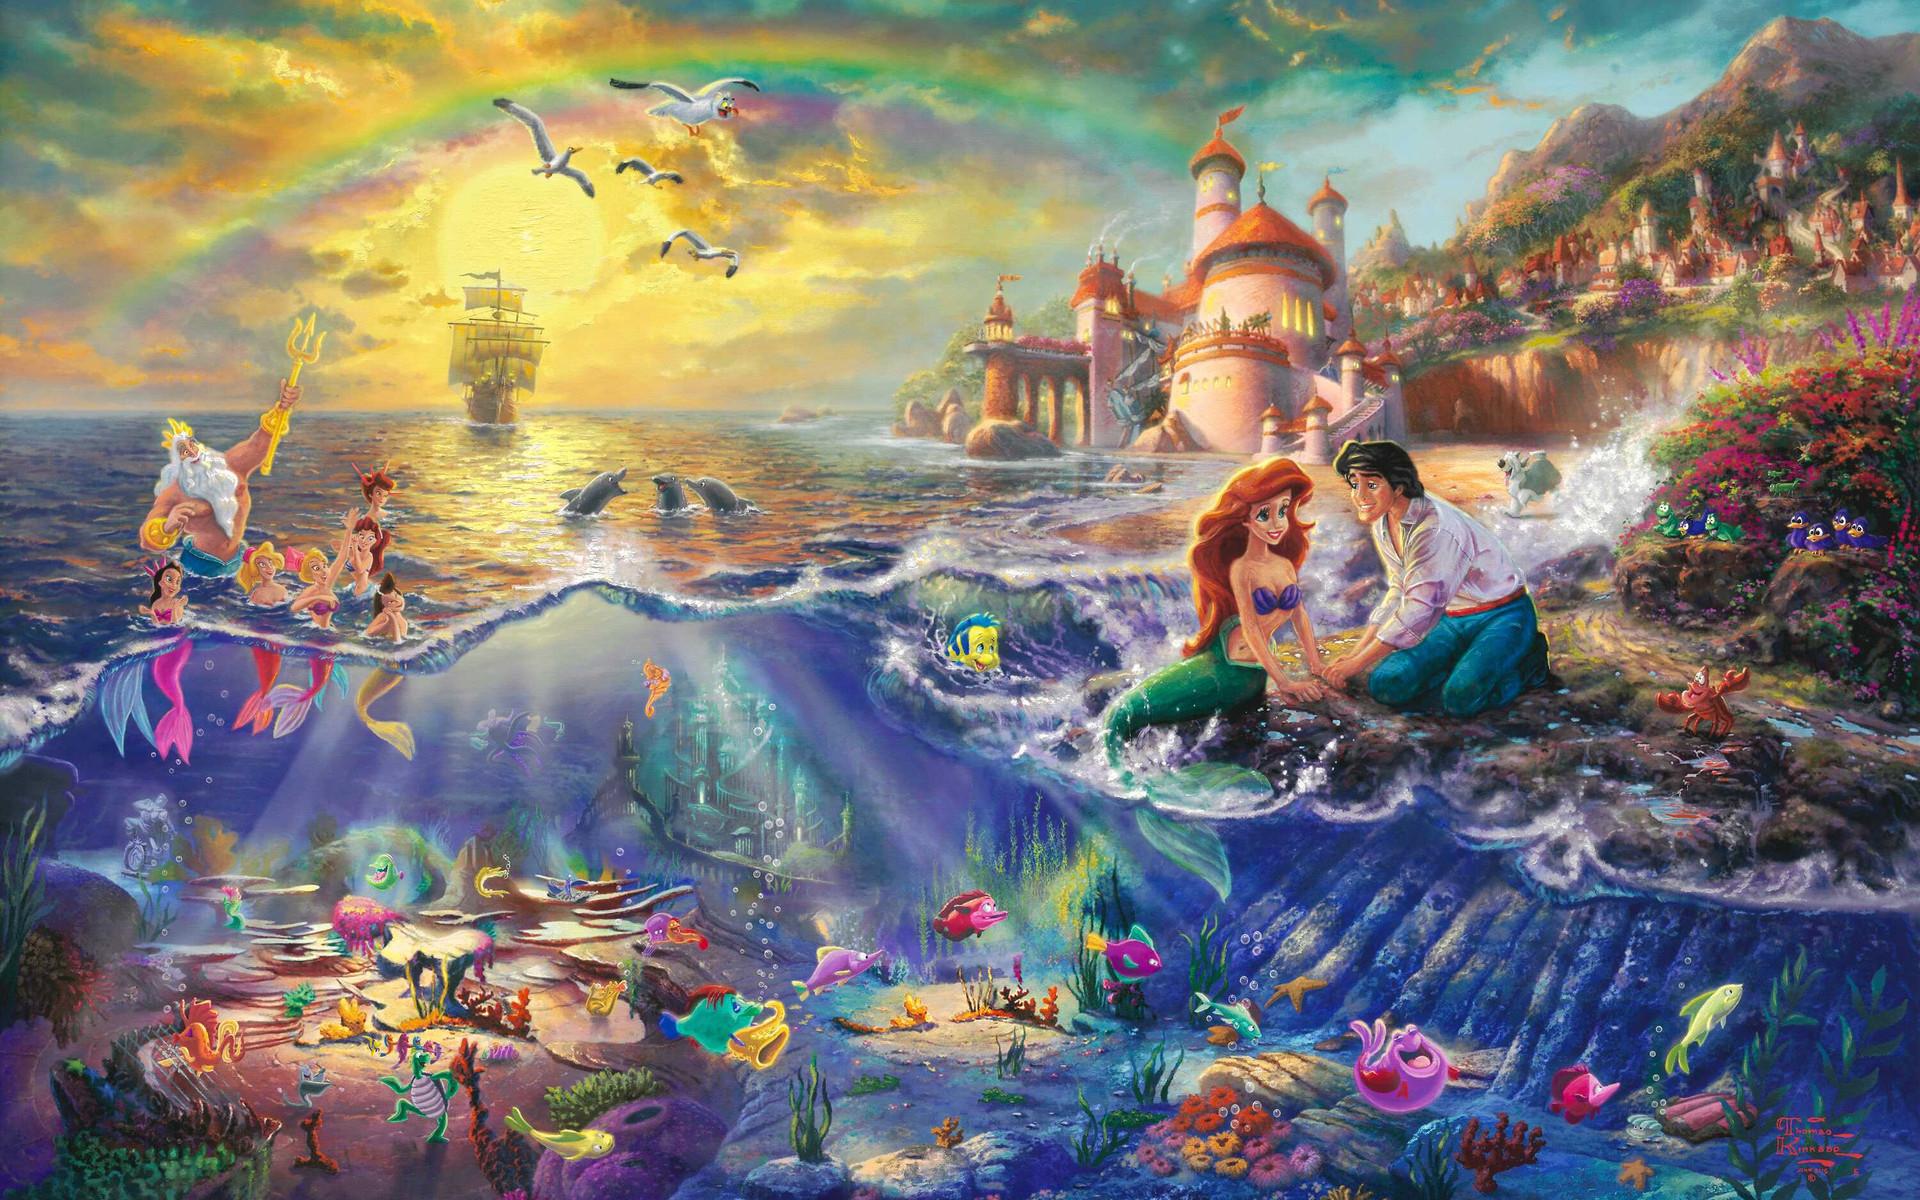 Disney Desktop Wallpaper 64 Images